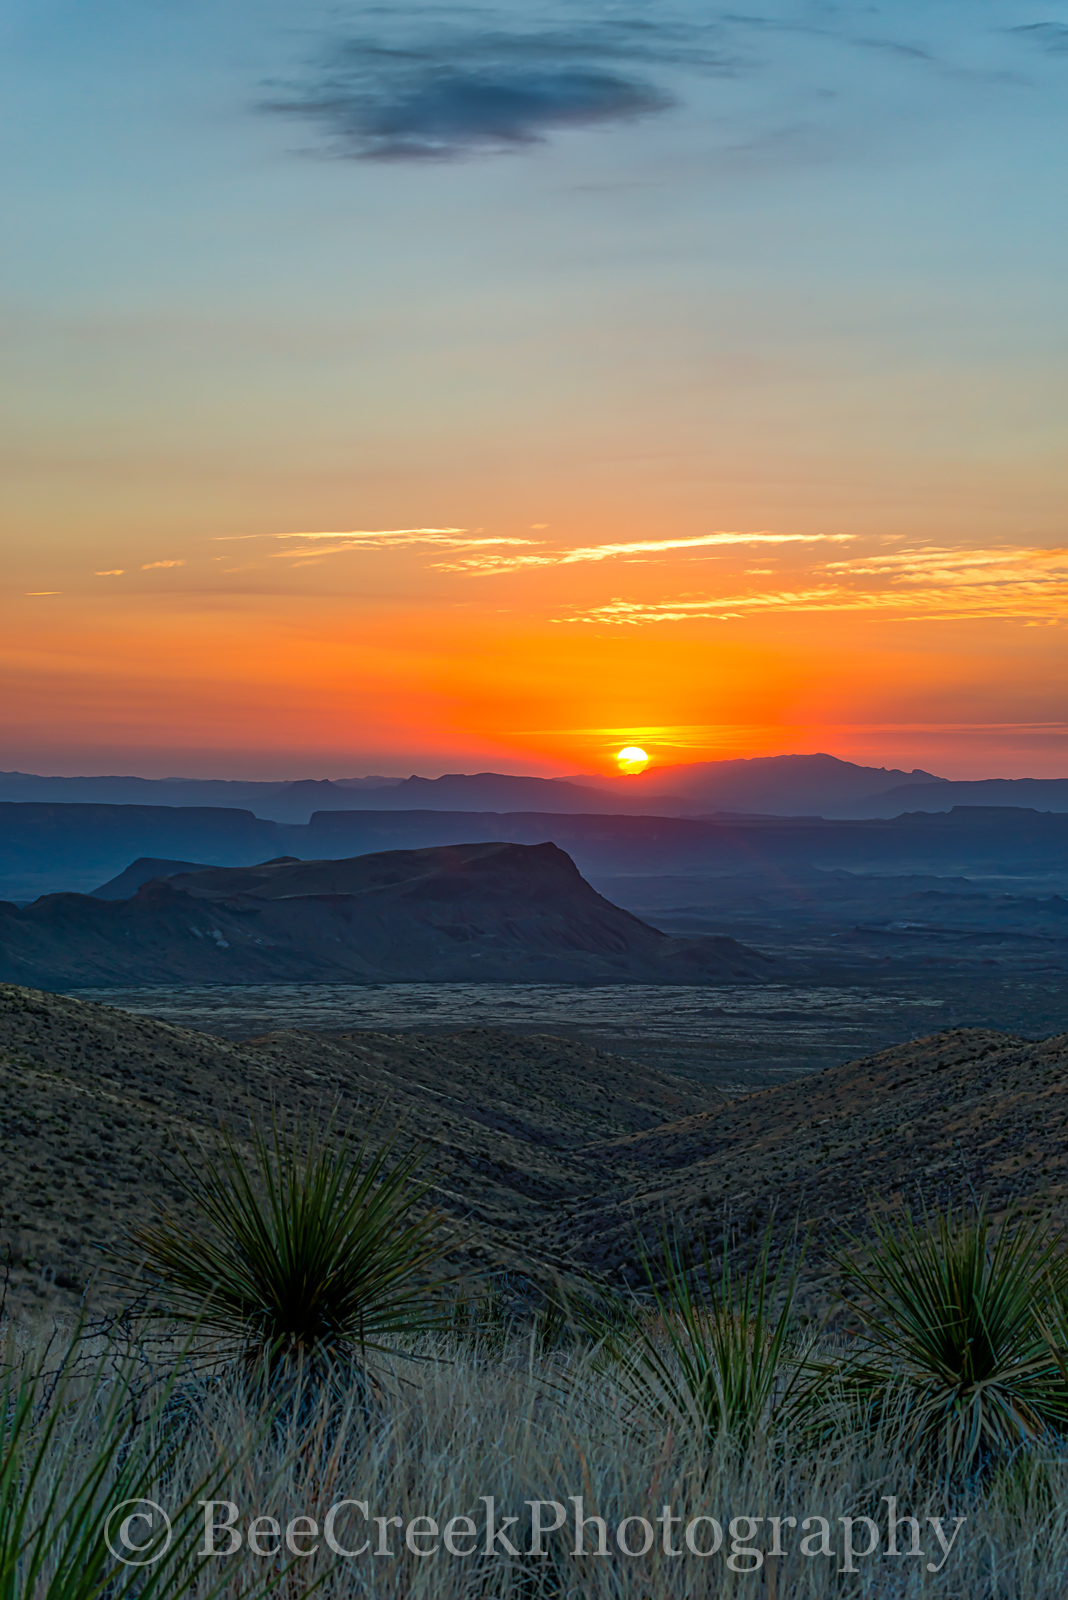 Big Bend National Park, Chihuahuan Desert, Mountains, Santa Elena Canyons, Sierra Ponce, Sotal Overlook, landscape, sunset, vertical, photo